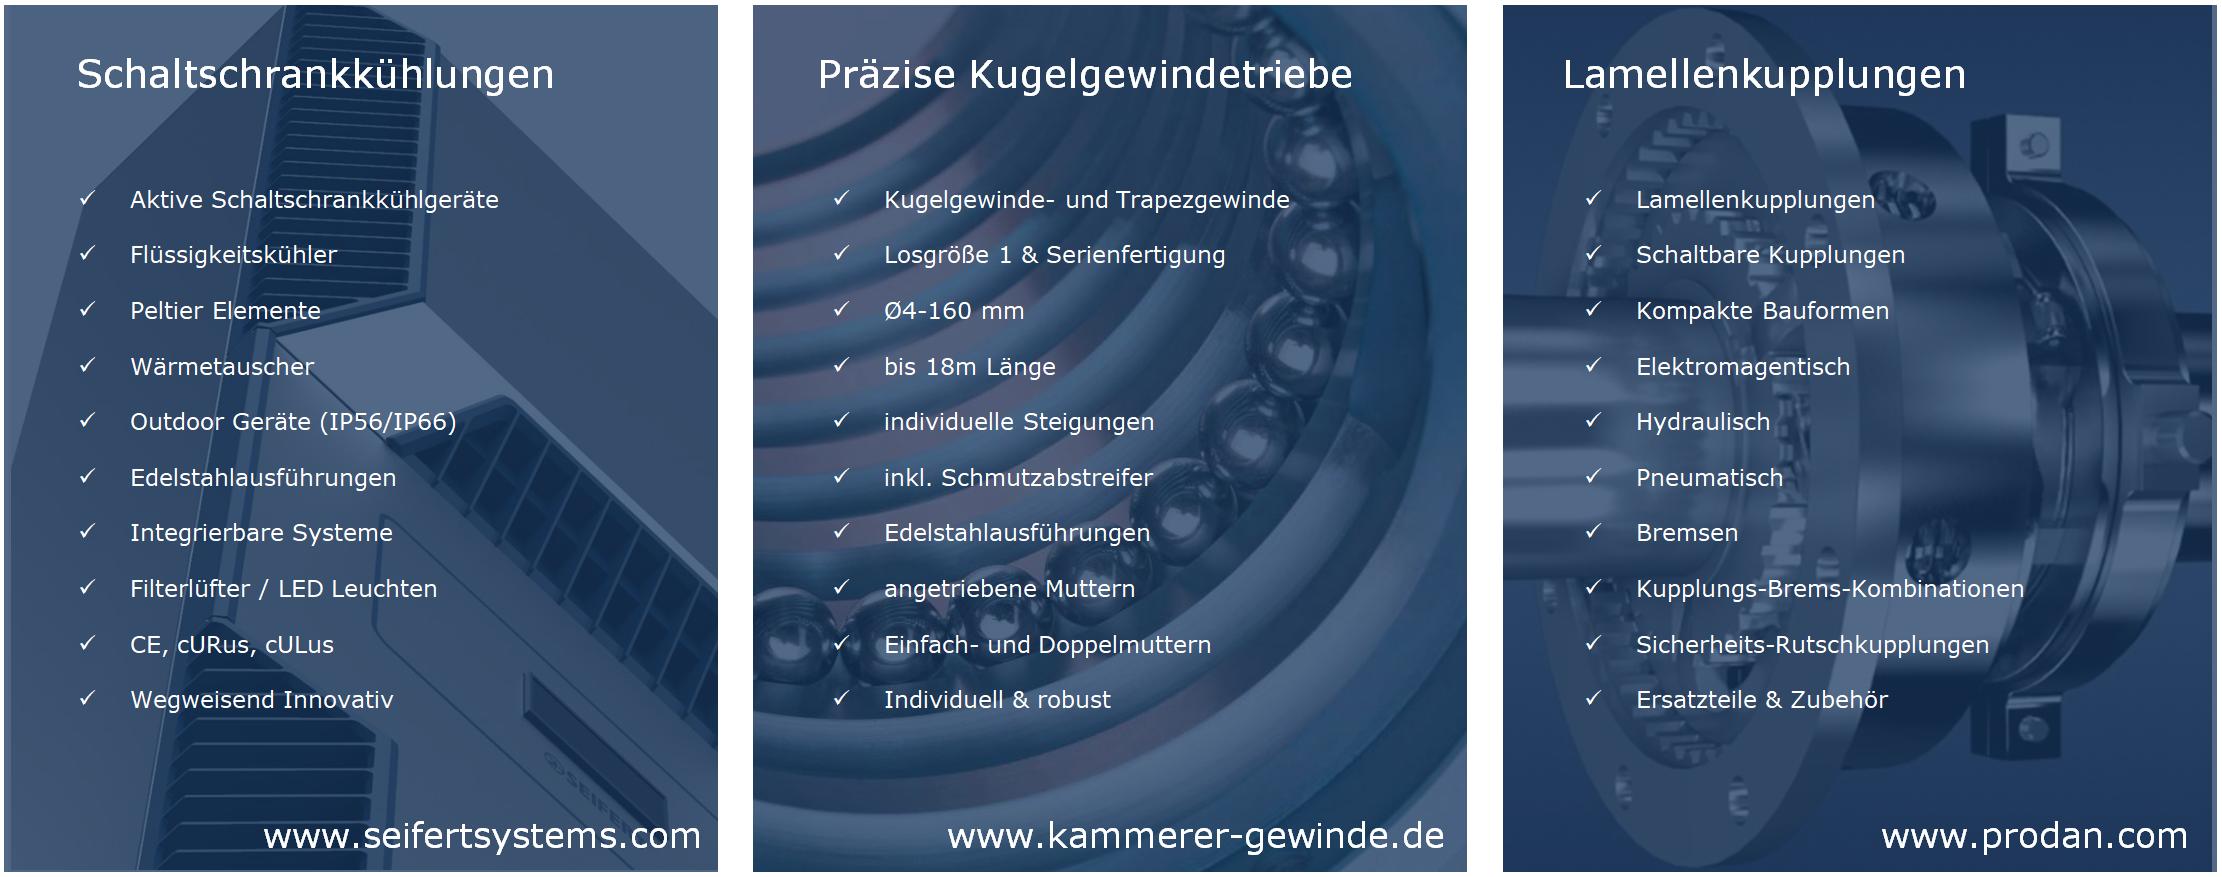 Produktübersicht Kammerer Seifert Systems Prodan